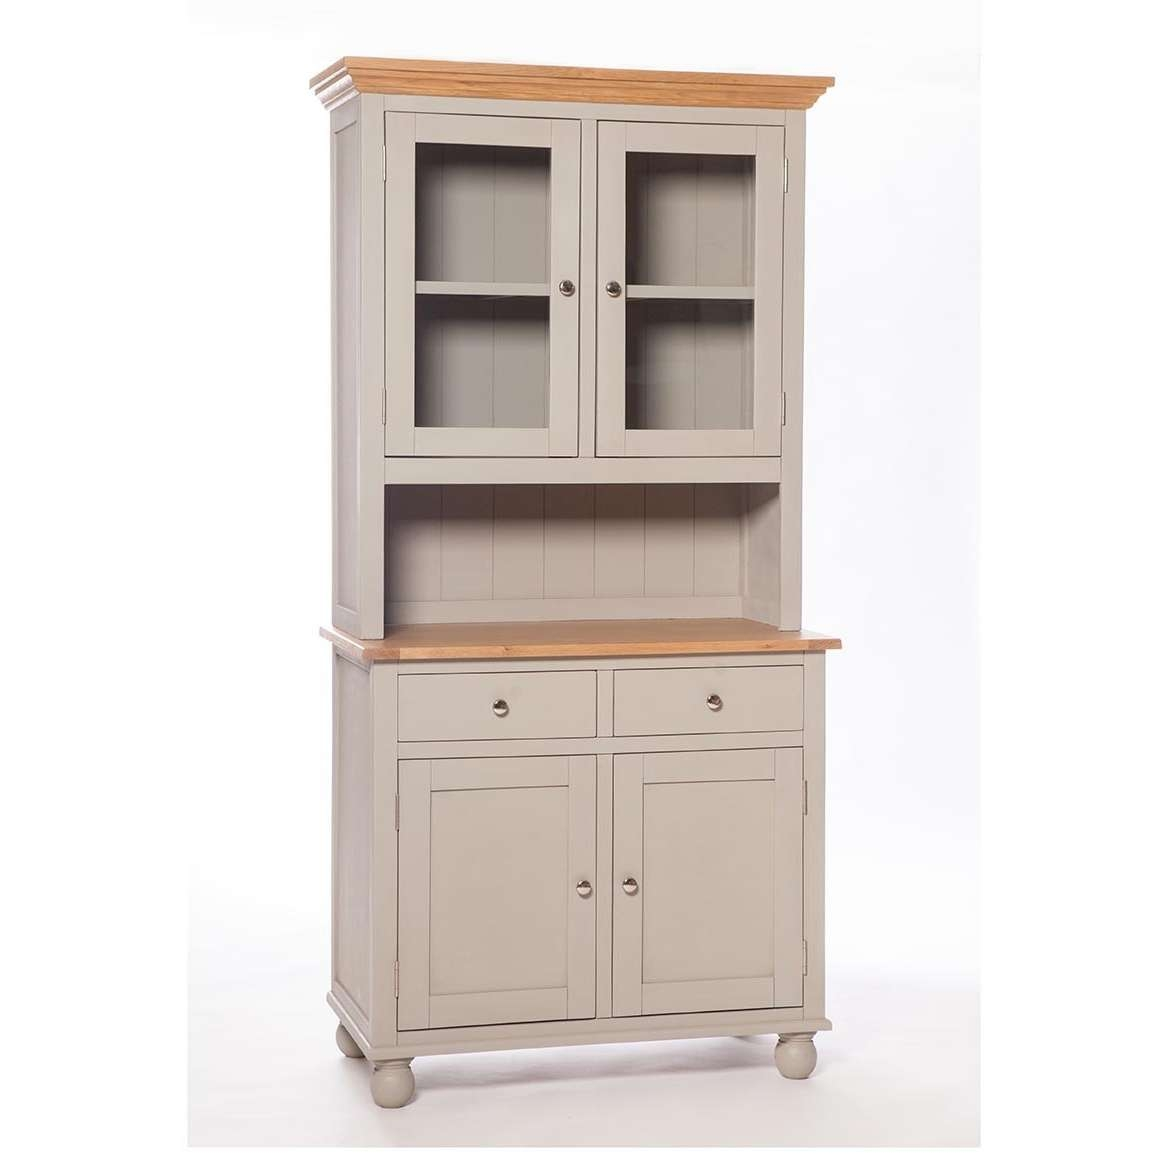 Somerset Small Kitchen Dresser | Woodlands Furniture Regarding Narrow Kitchen Sideboards (View 18 of 20)